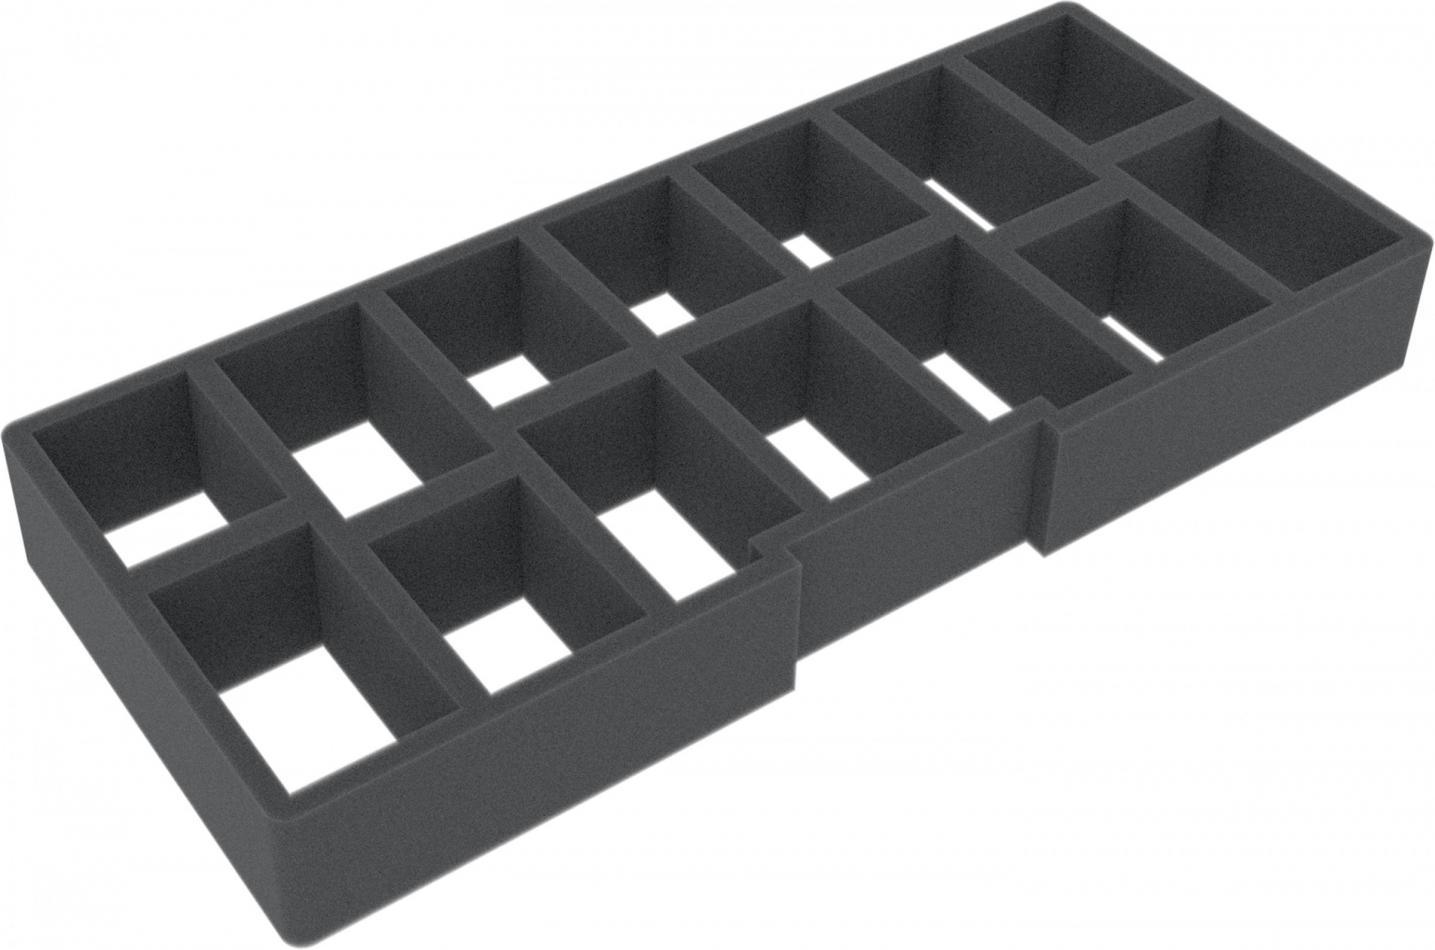 ADBY031 Feldherr Refill foam insert for Chessex Box small - 14 compartments